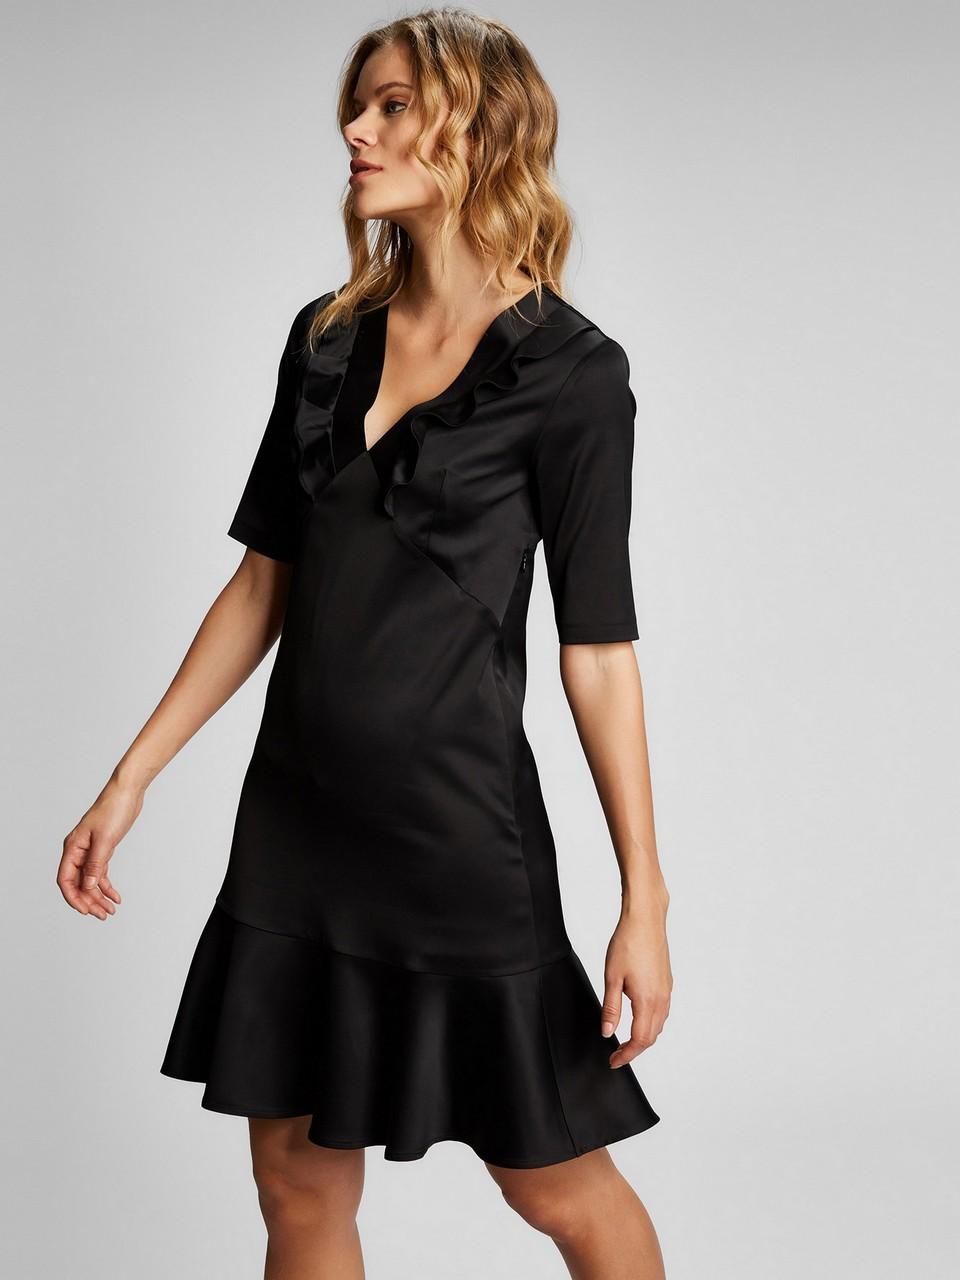 Volanlı Saten Elbise